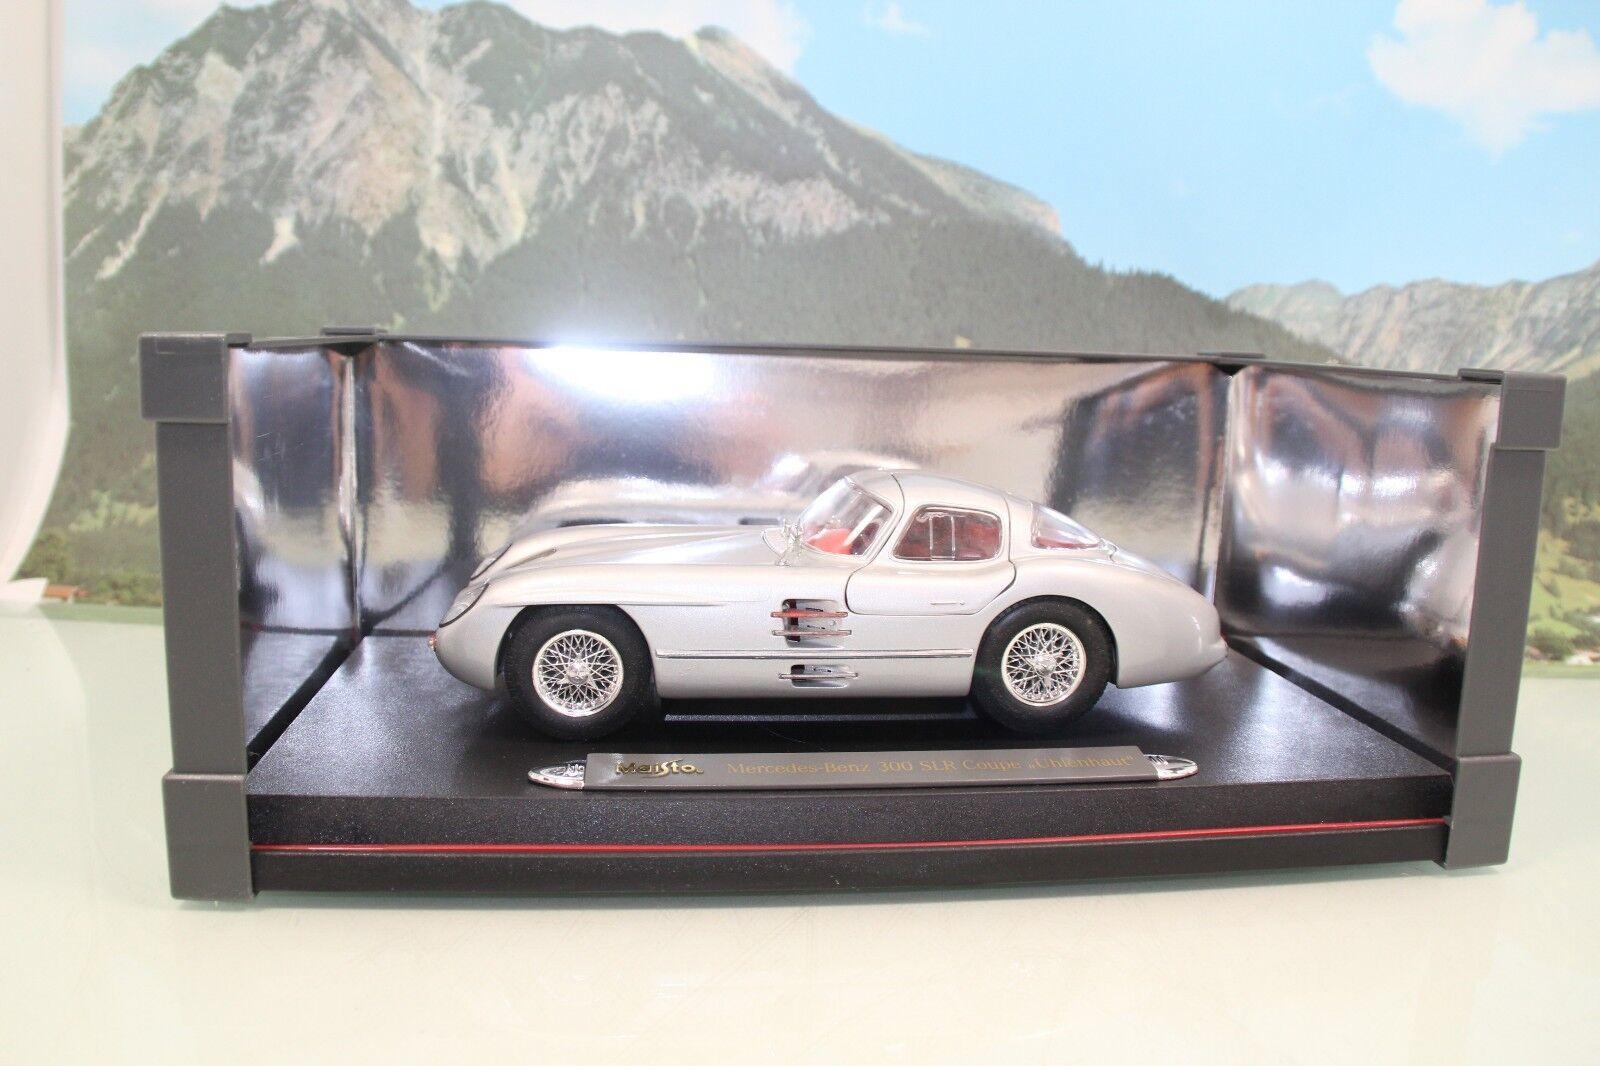 Maisto 536898 1 18 Mercedes-Benz 300 SLR coupr  Uhlenhaut  neuf dans sa boîte (b499)